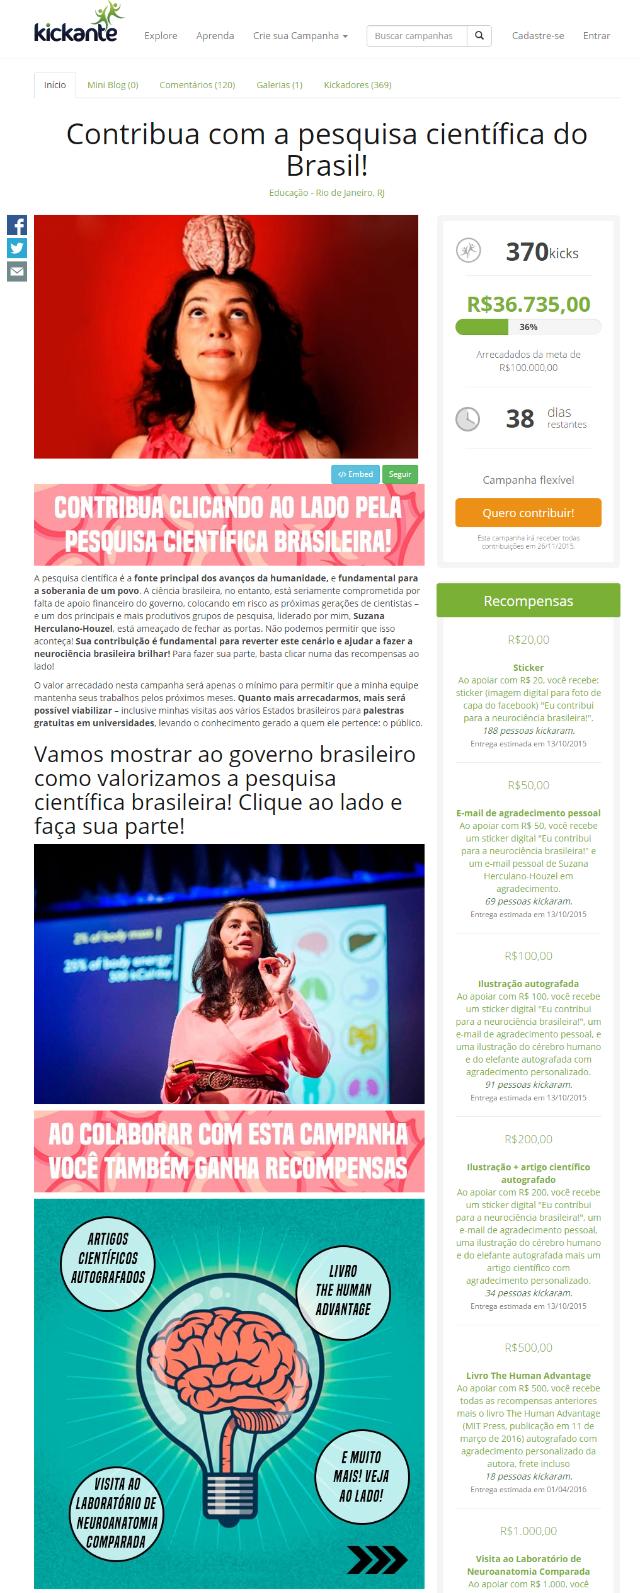 Suzana-Herculano-Houzel-Kickante-Campanha